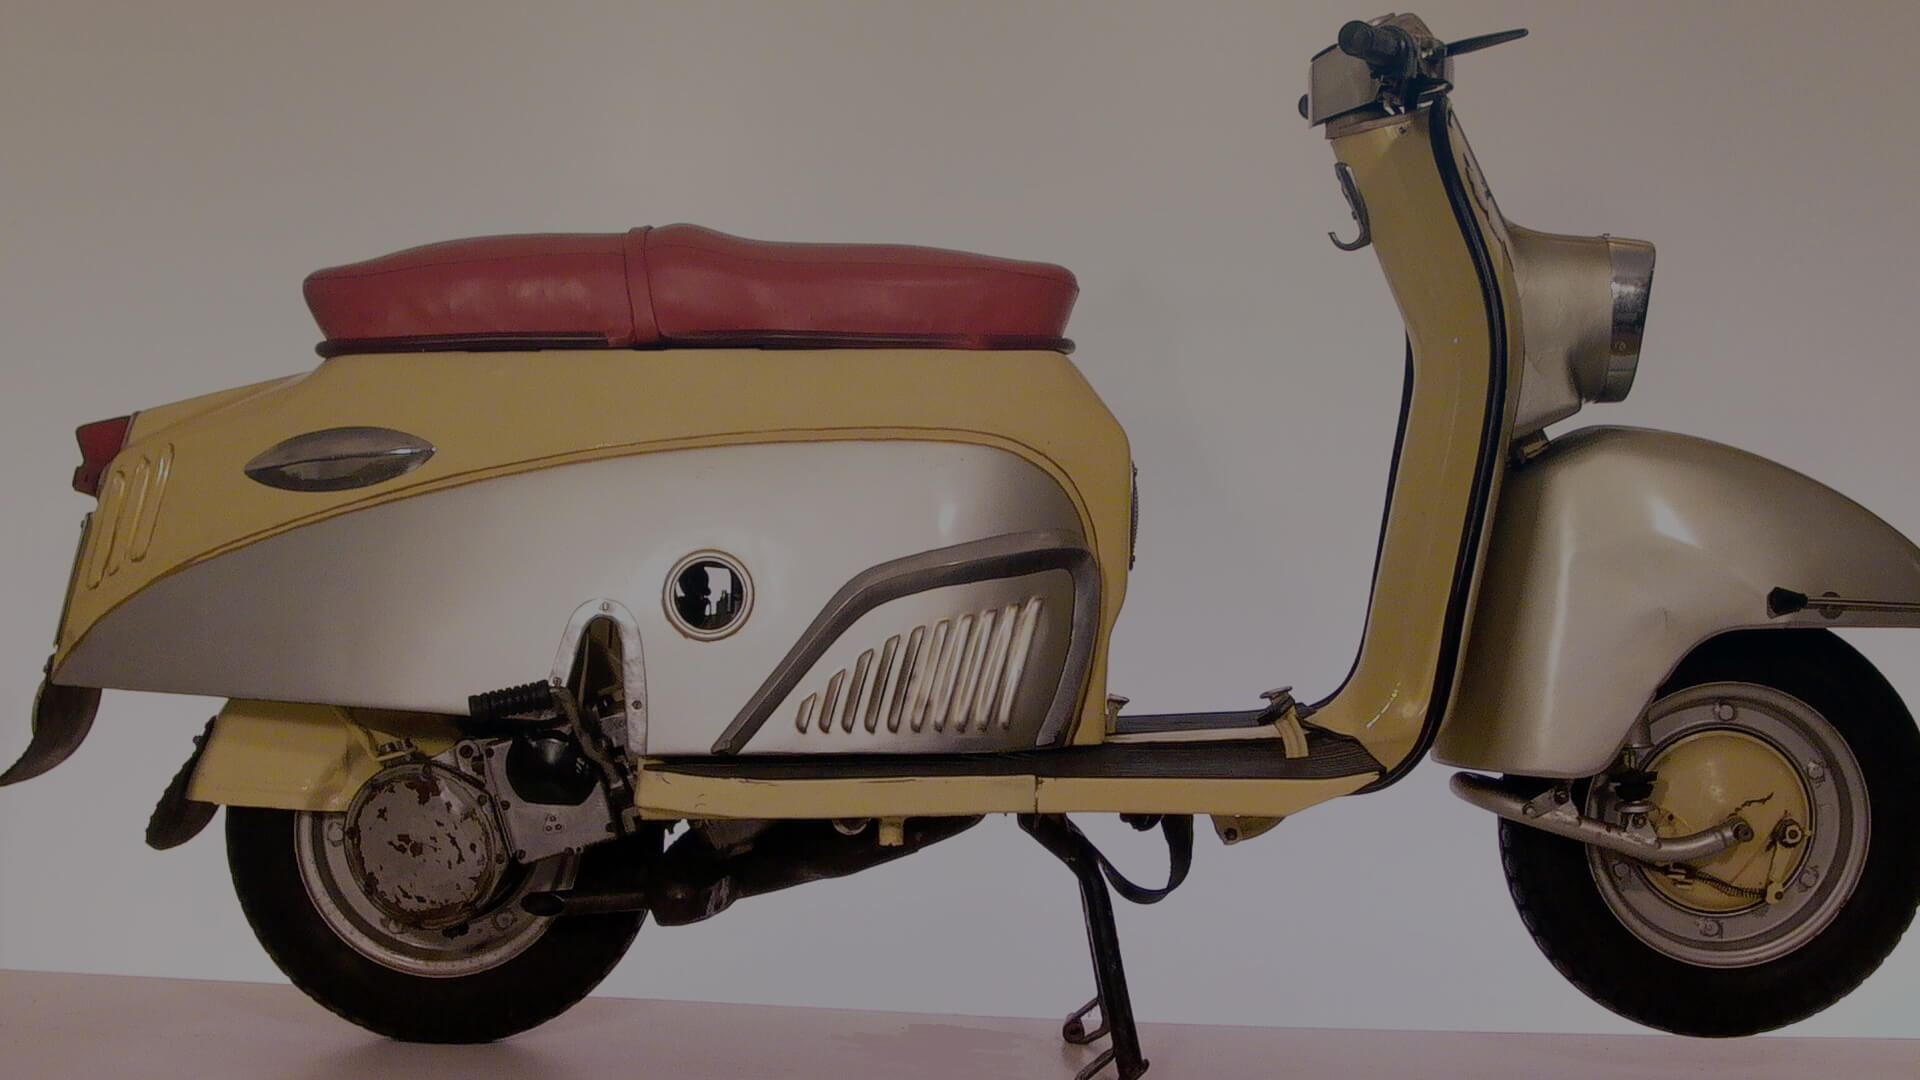 TÜNDE scooter, 174 cc, 1961